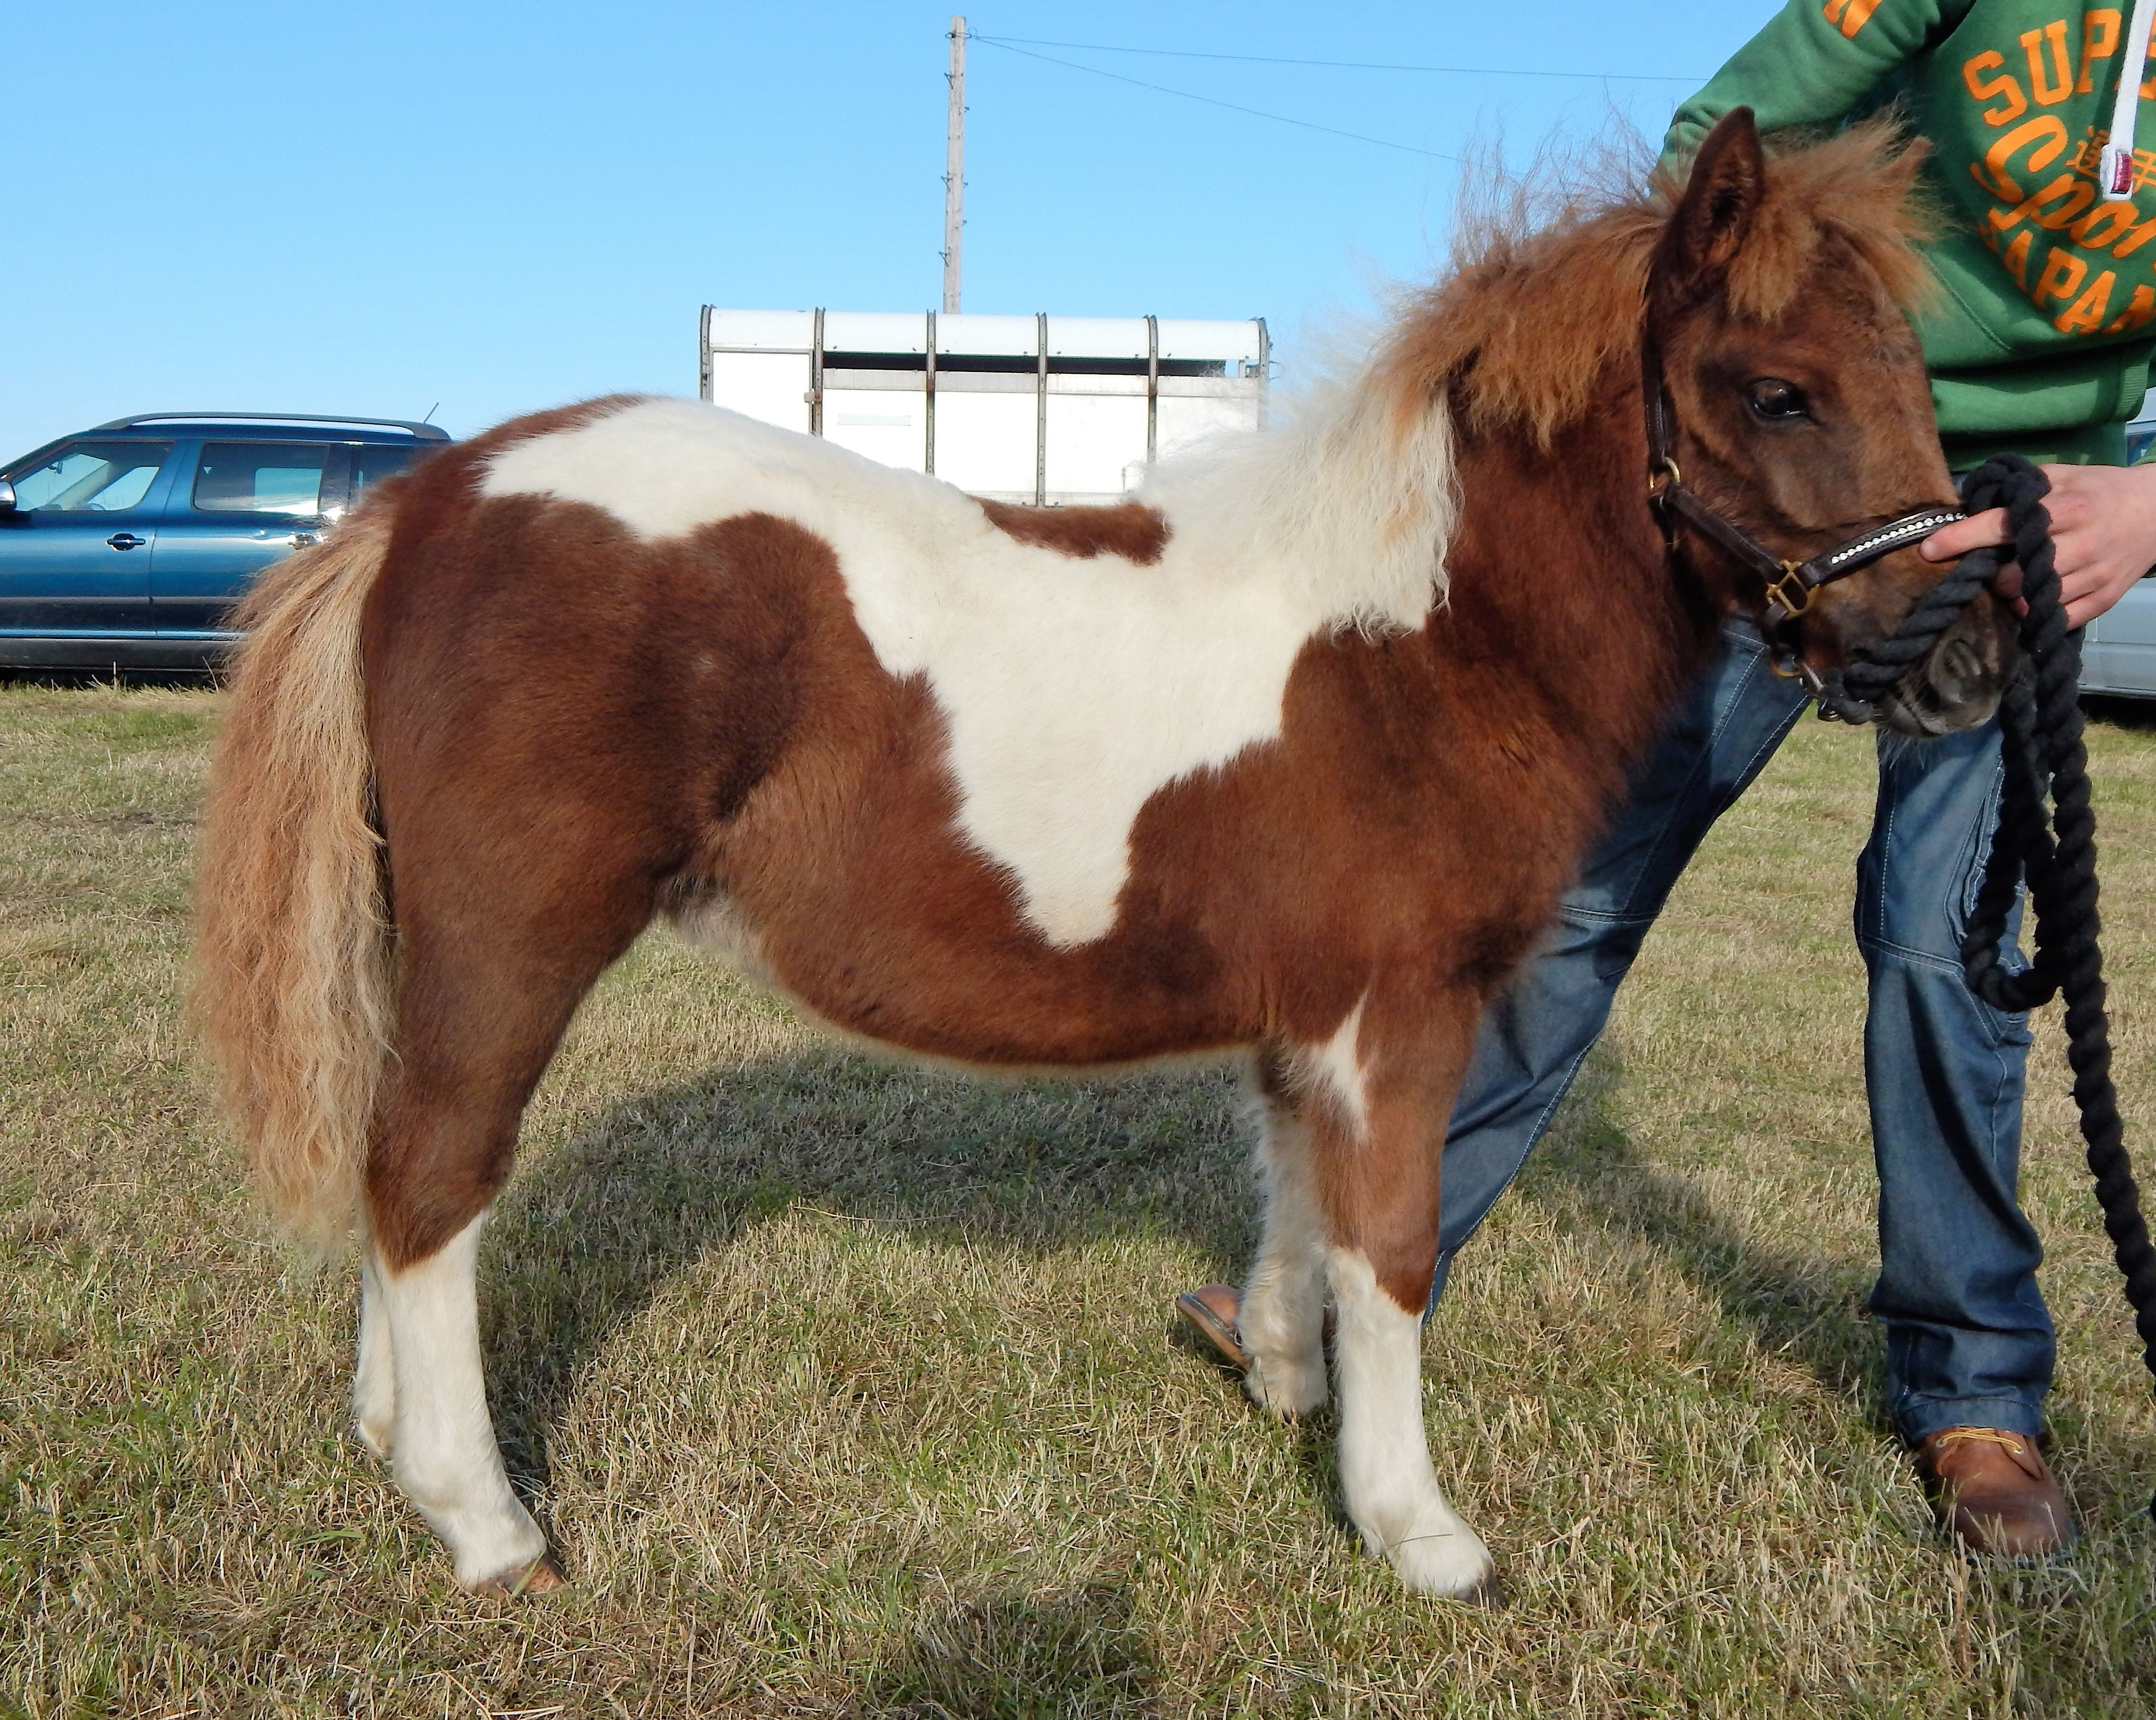 Lot 37 - Skewbald - Standard - Filly Foal, - DOB: 30th April 2017